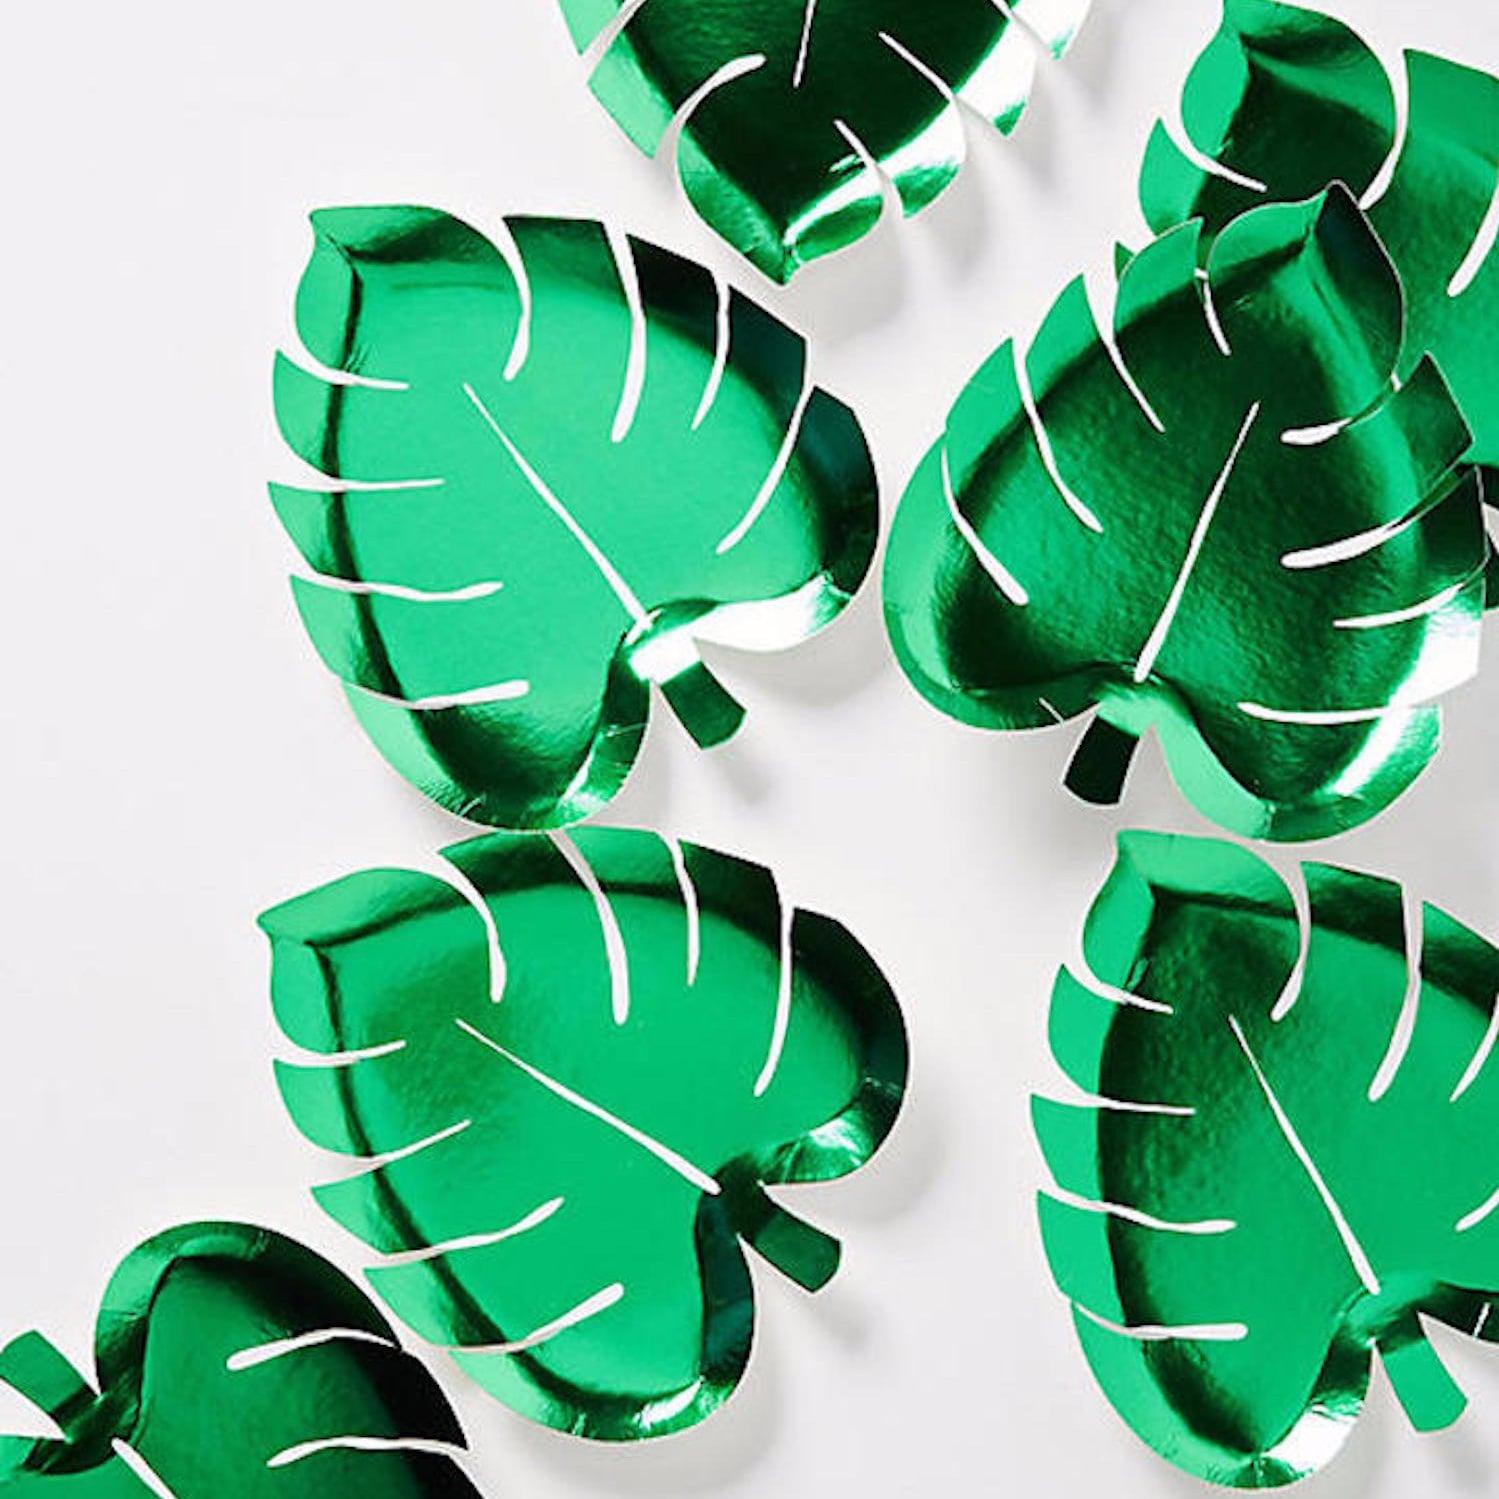 sc 1 st  Popsugar & Best Disposable Plates and Cups | POPSUGAR Home